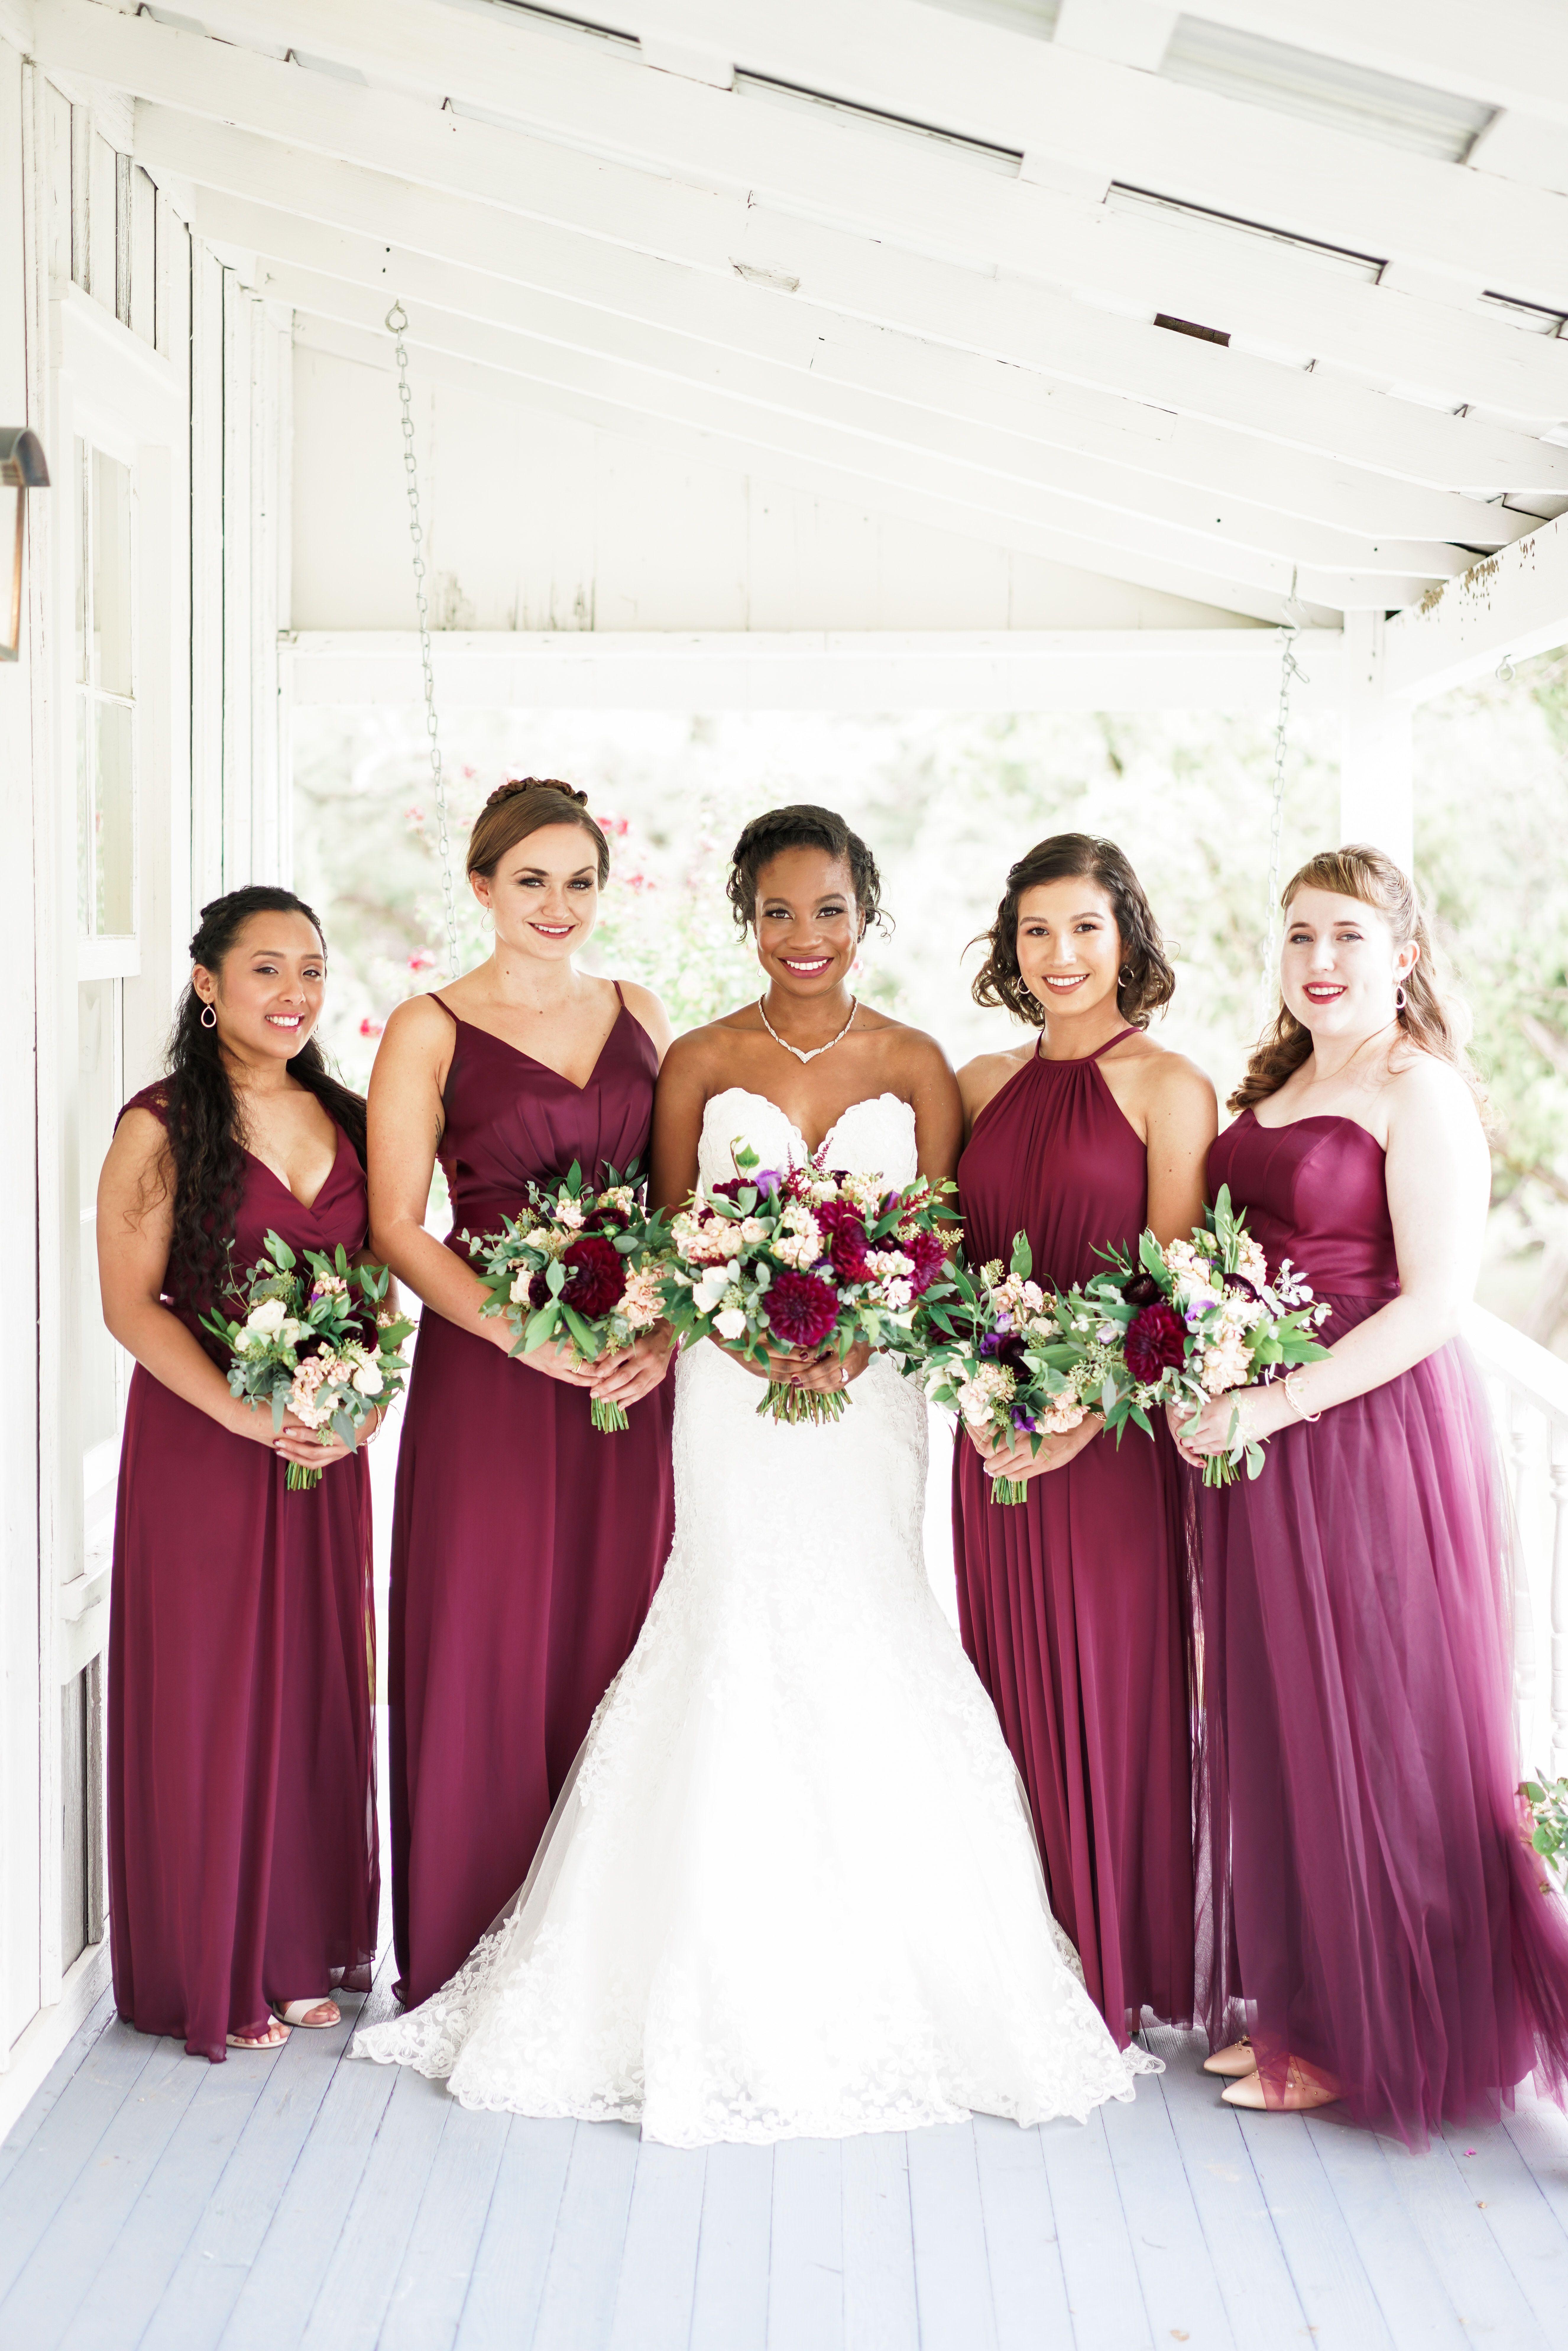 High School Sweethearts Wedding At The Ivory Oak In Texas